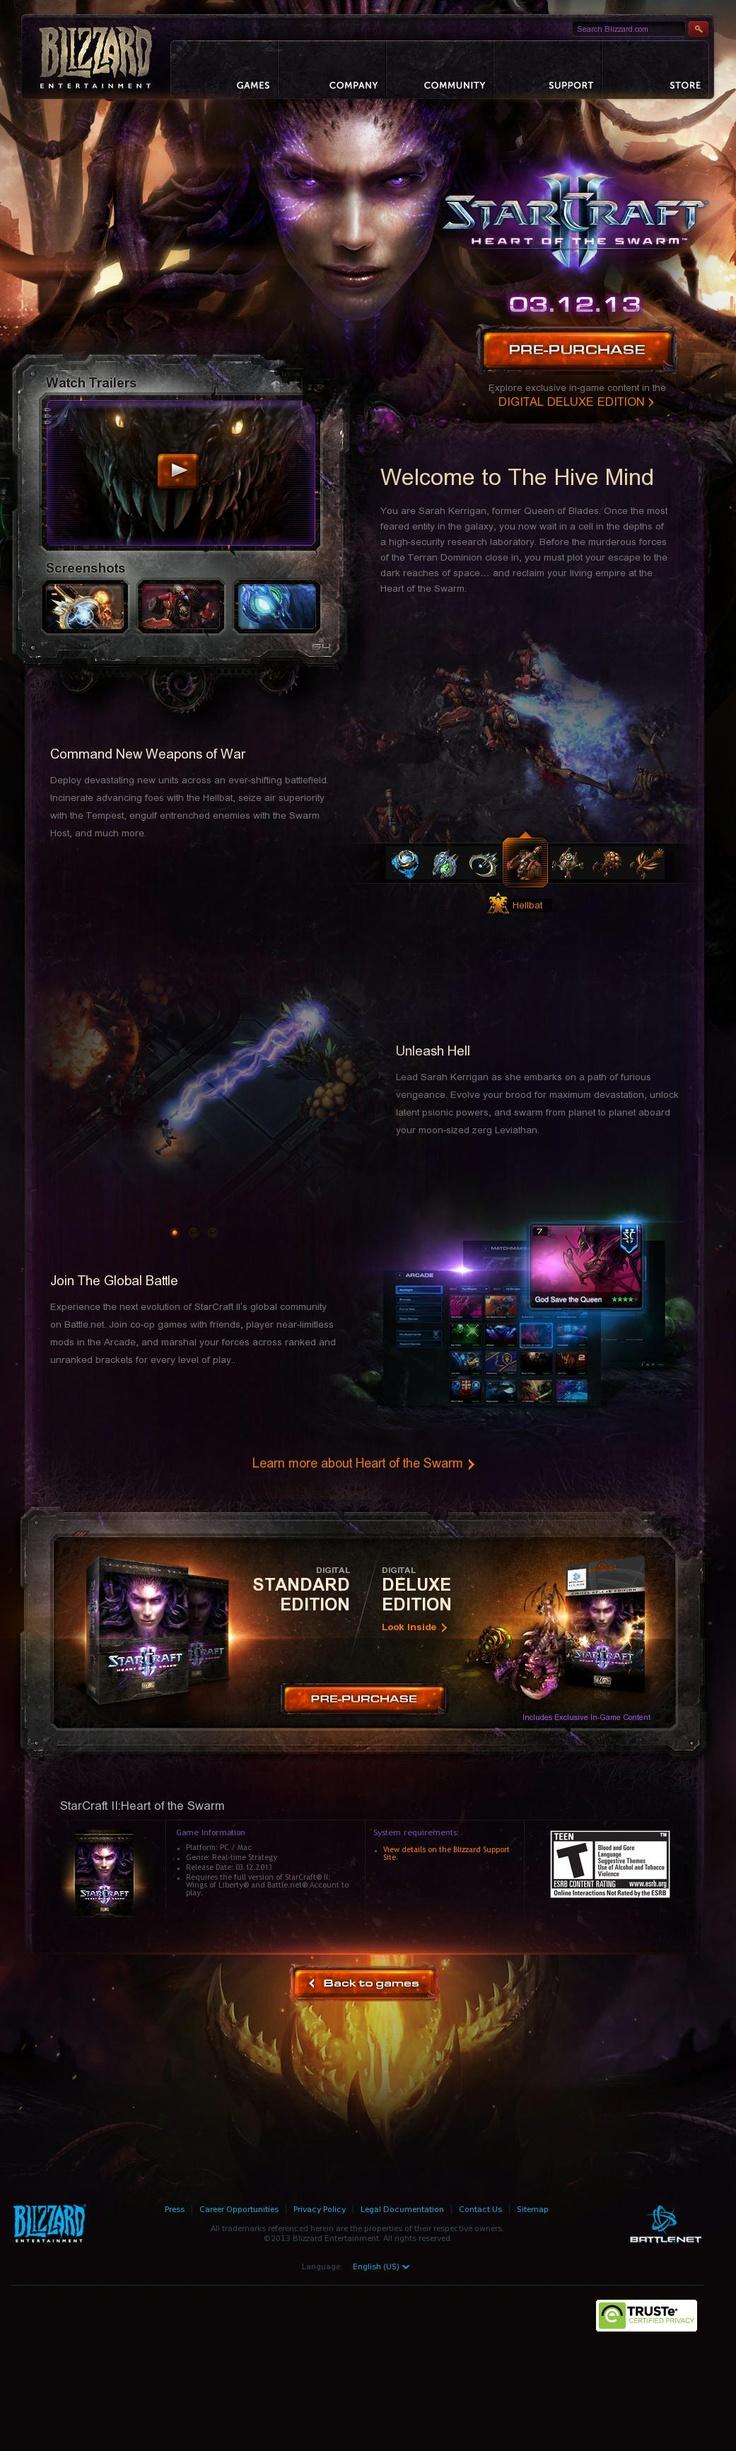 StarCraft II: Heart of the Swarm  http://us.blizzard.com/en-us/games/hots/